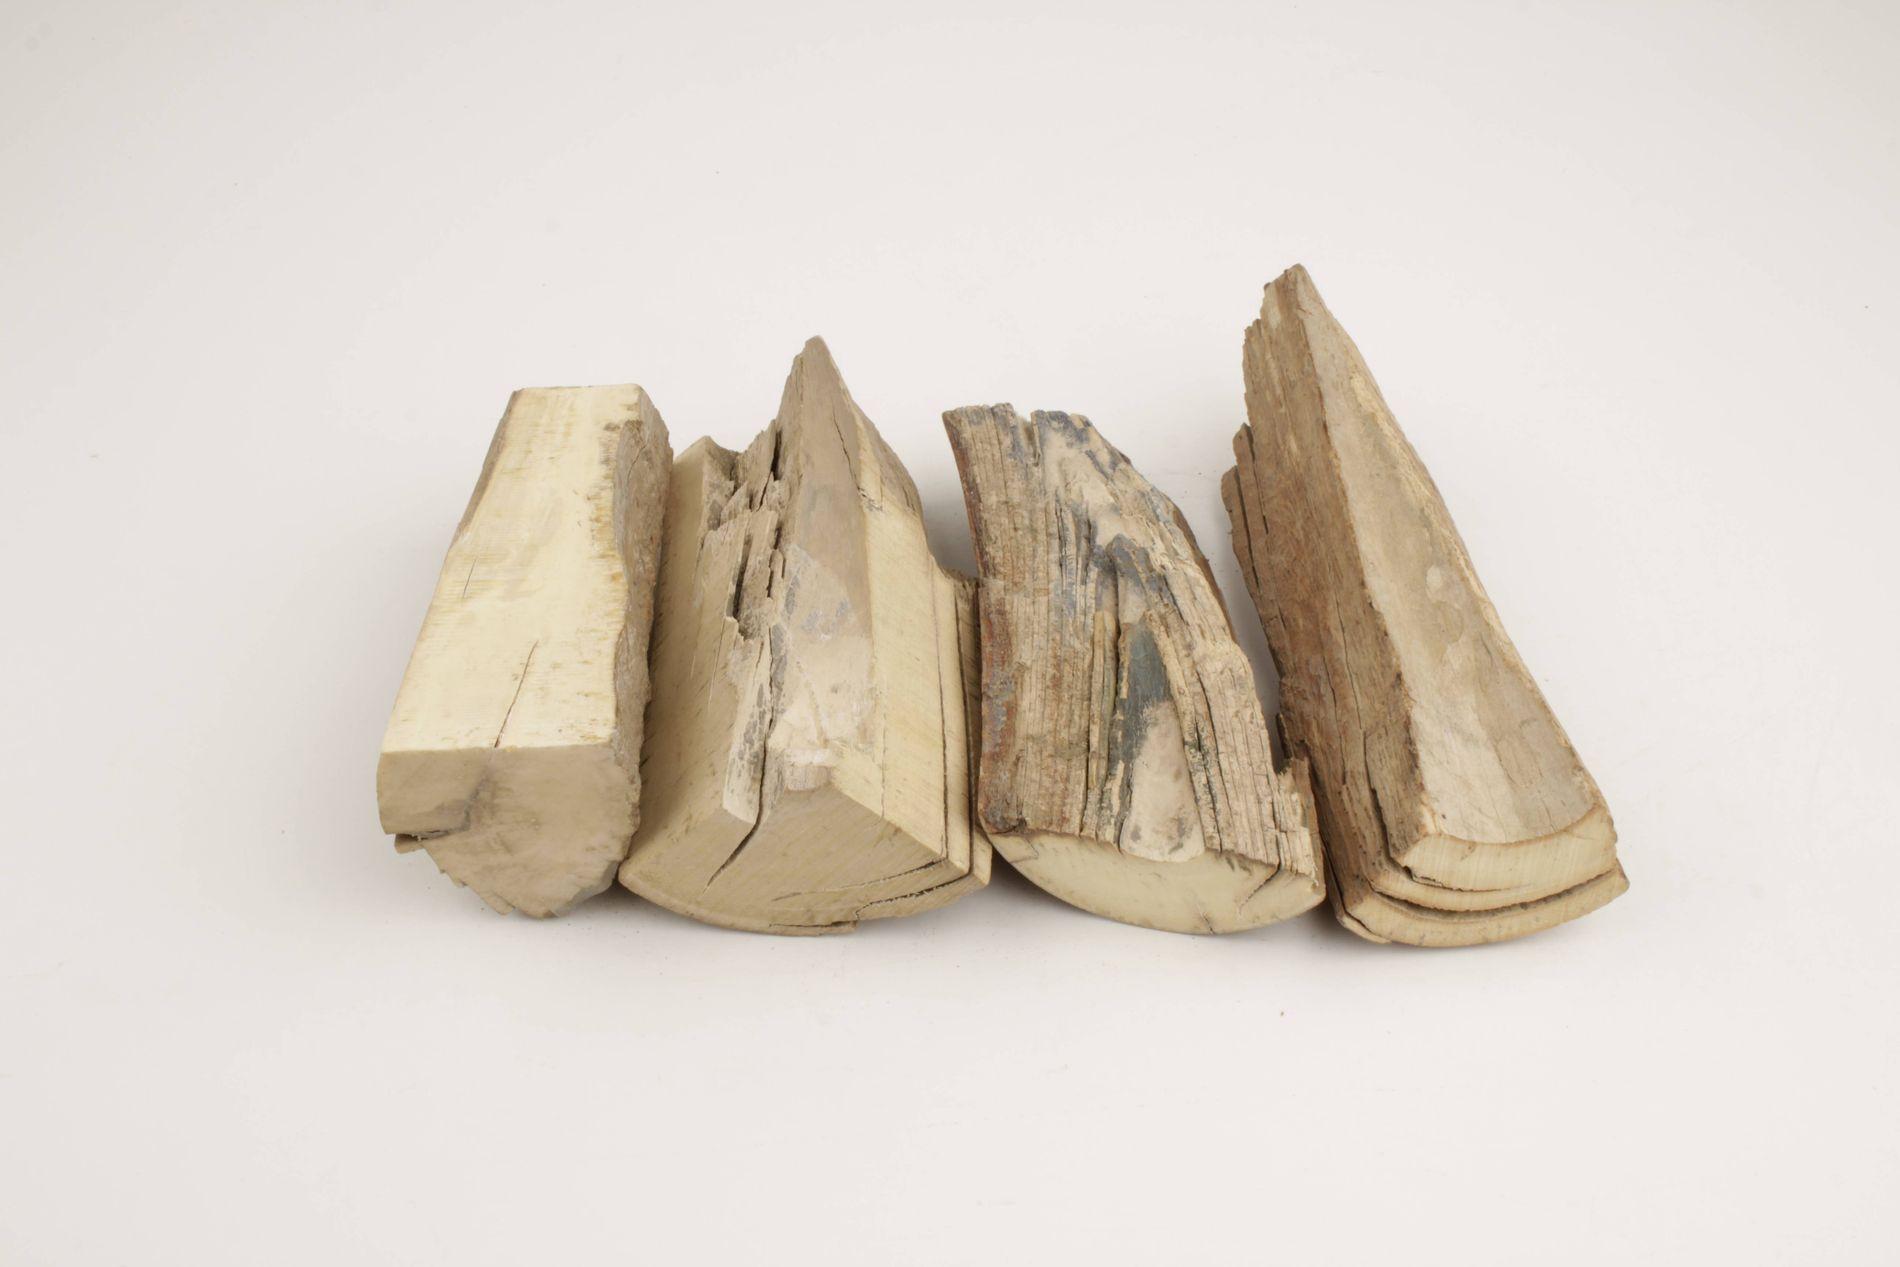 Raw mammoth ivory pieces